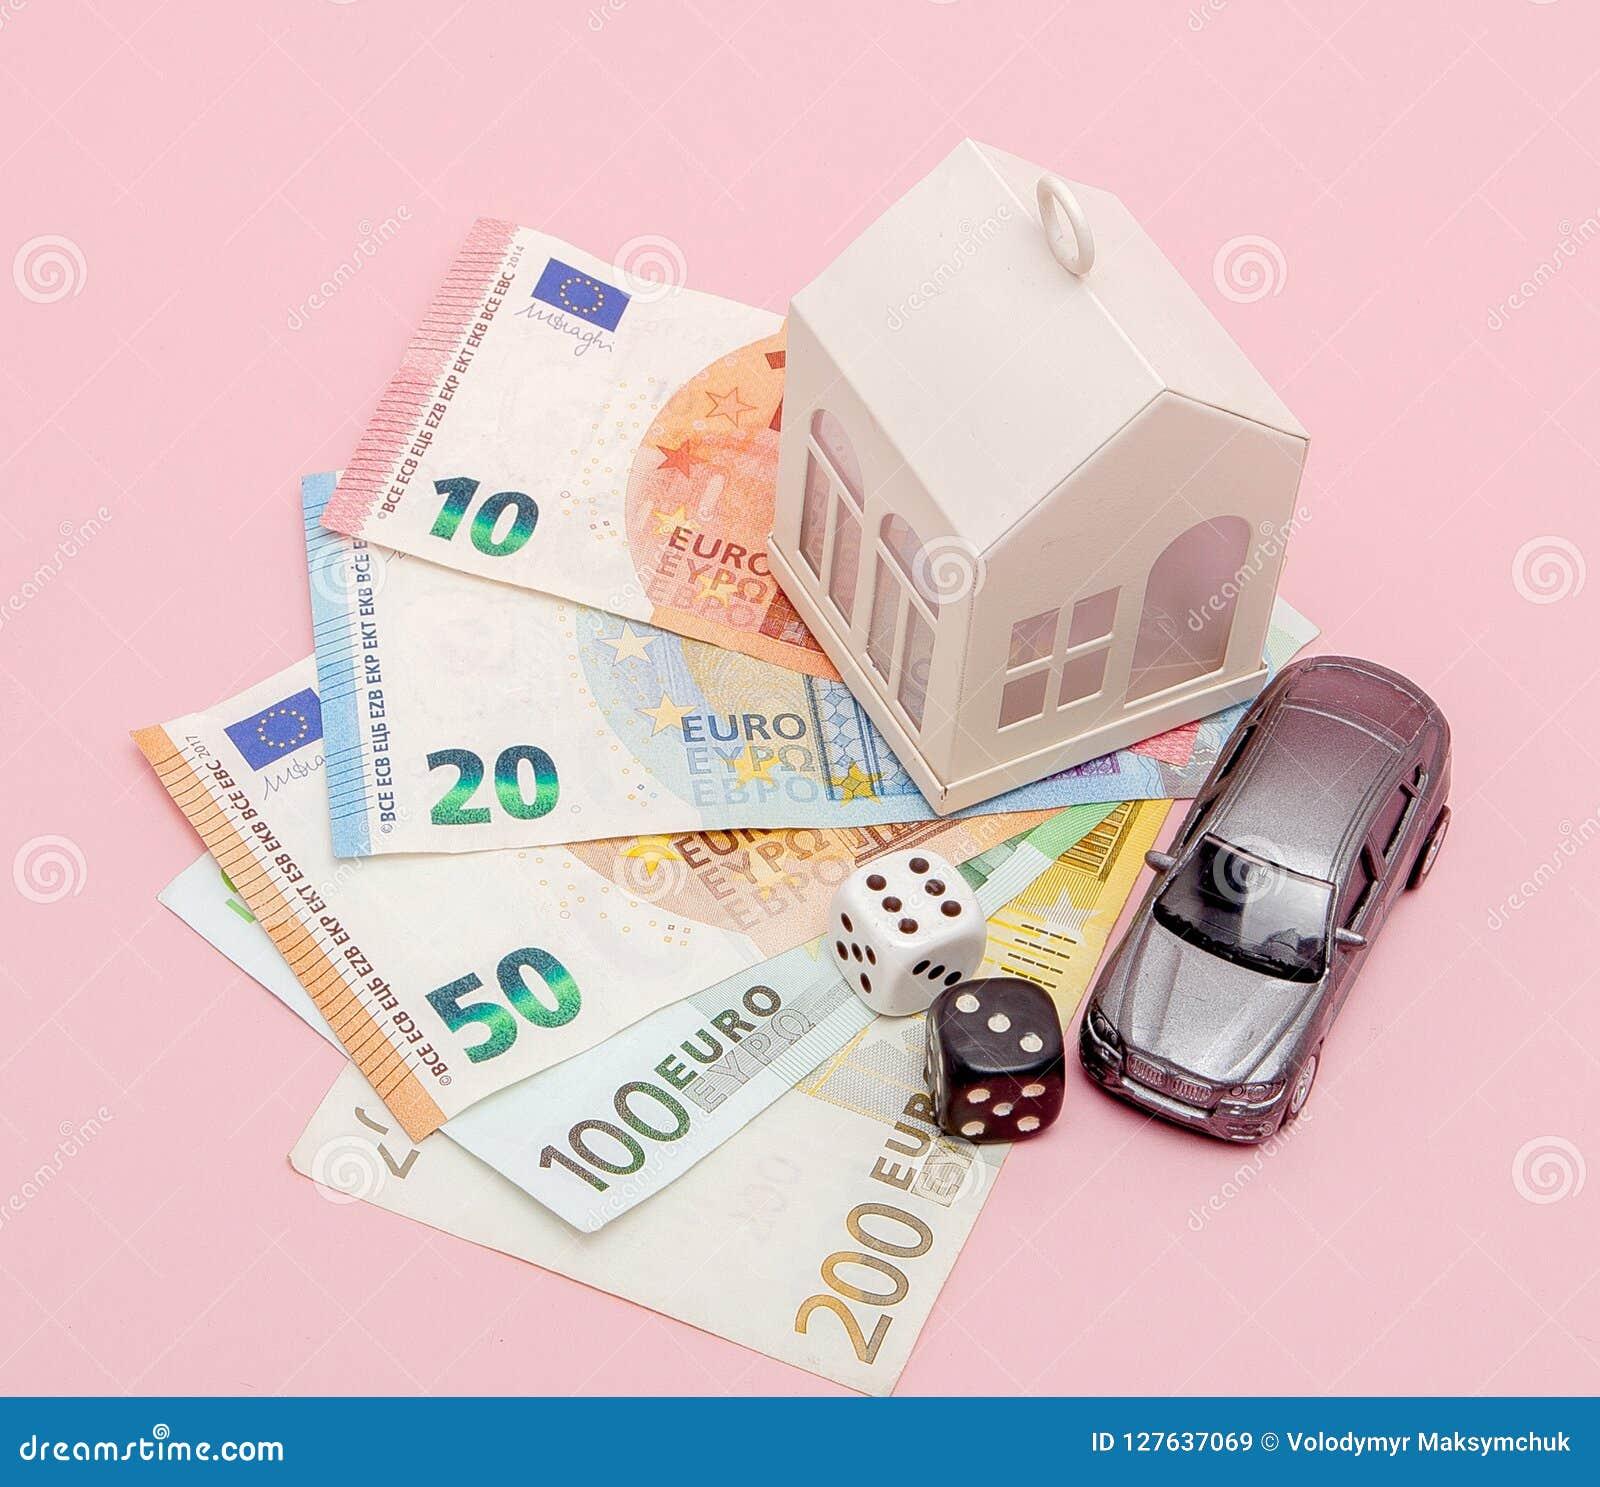 Euro dice casino gsn casino app